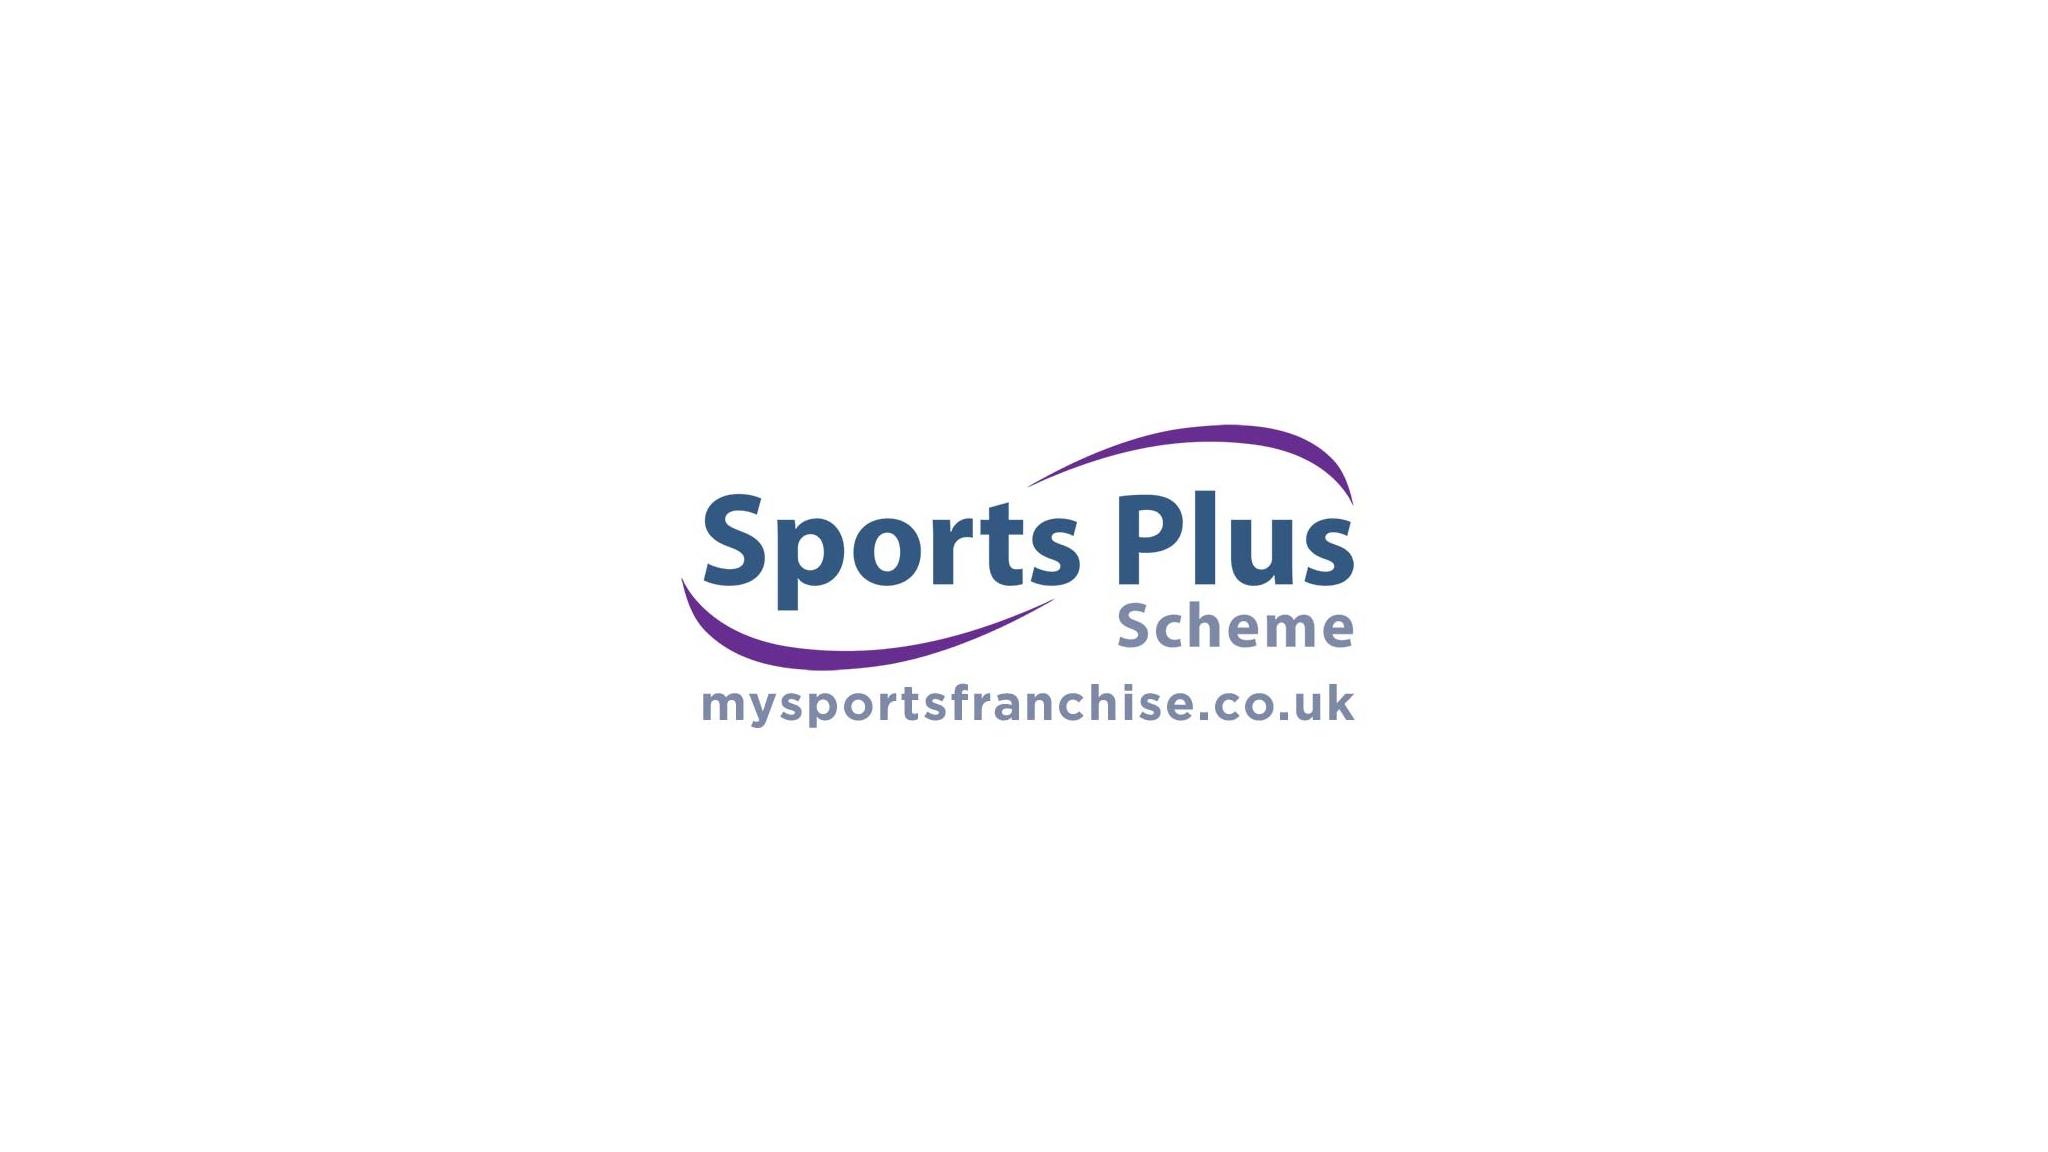 Sports Plus Scheme - My Sports Franchise (@sportsplusschemefranchise) Cover Image